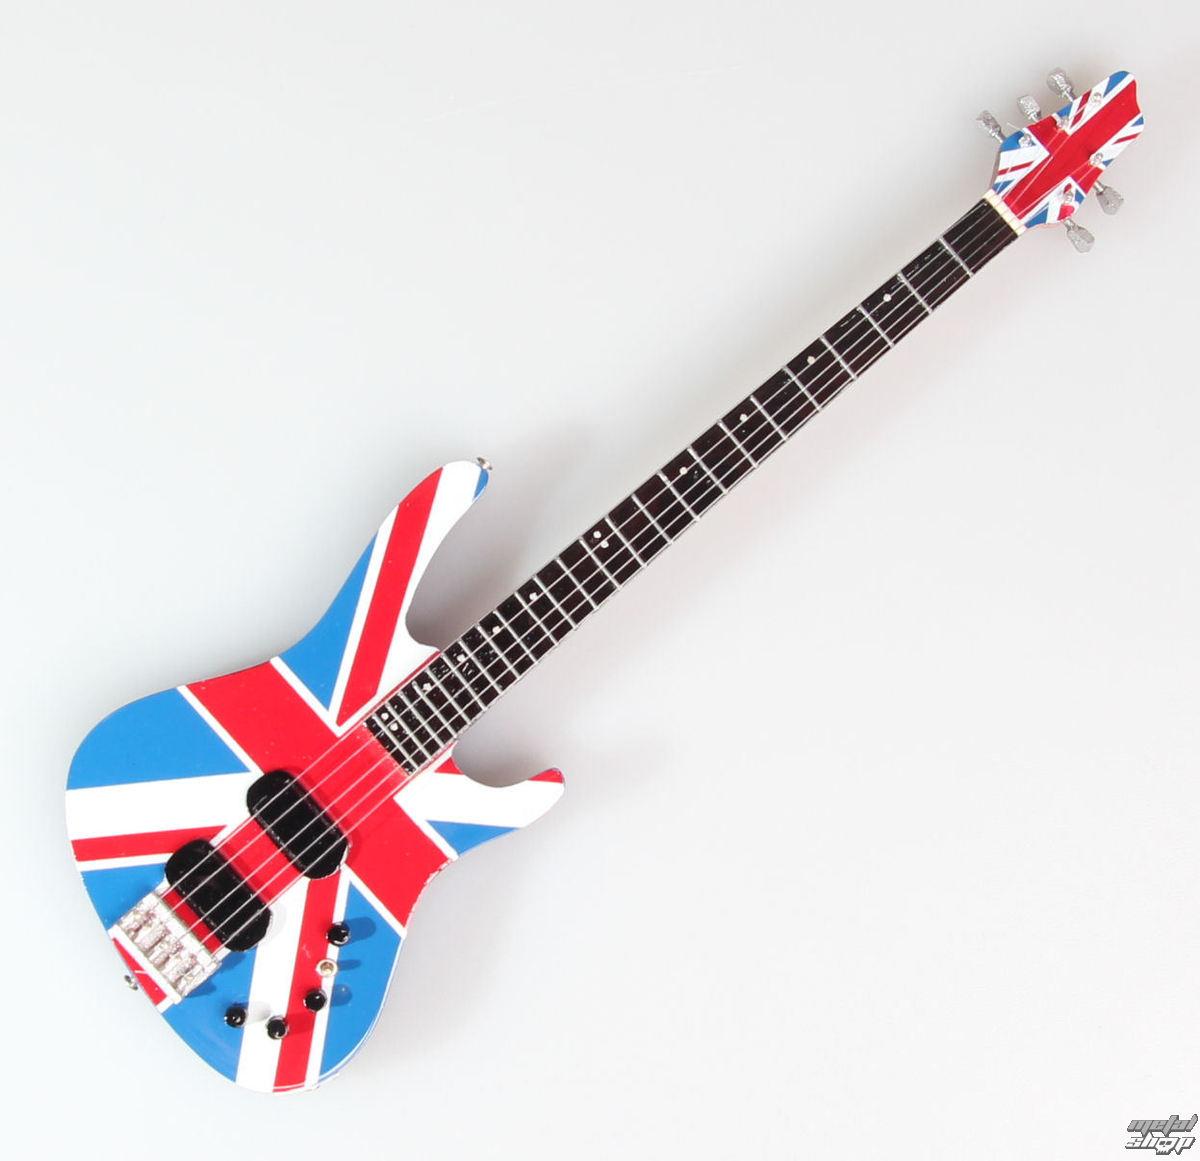 gitara Def Leppard - Rick Savage - Union Jack - MINI GUITAR USA - DLRS